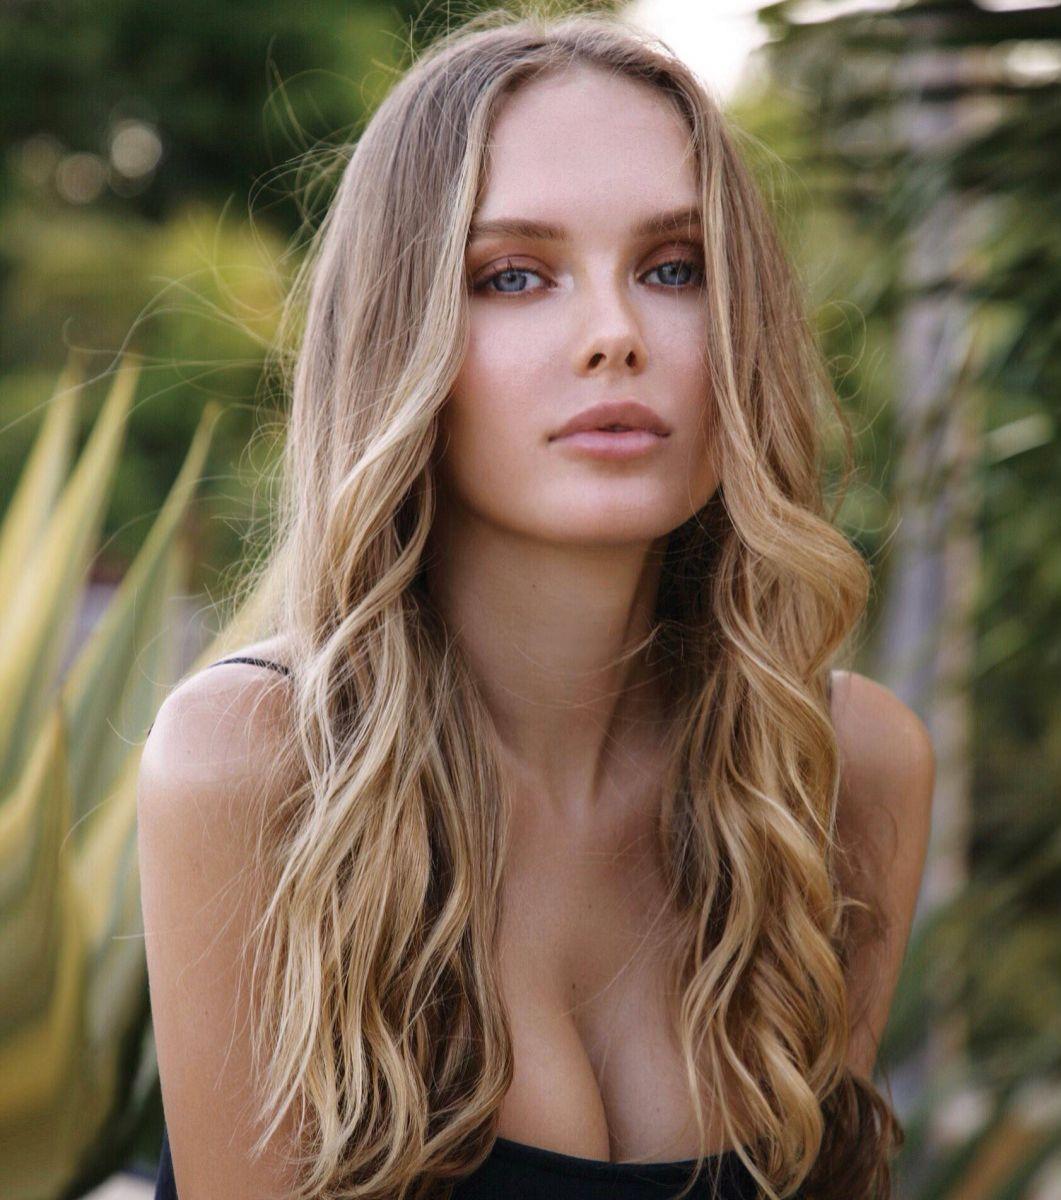 Balistarz-model-Angelina-Boyko-portrait-shoot-with-plants-in-trendy-top